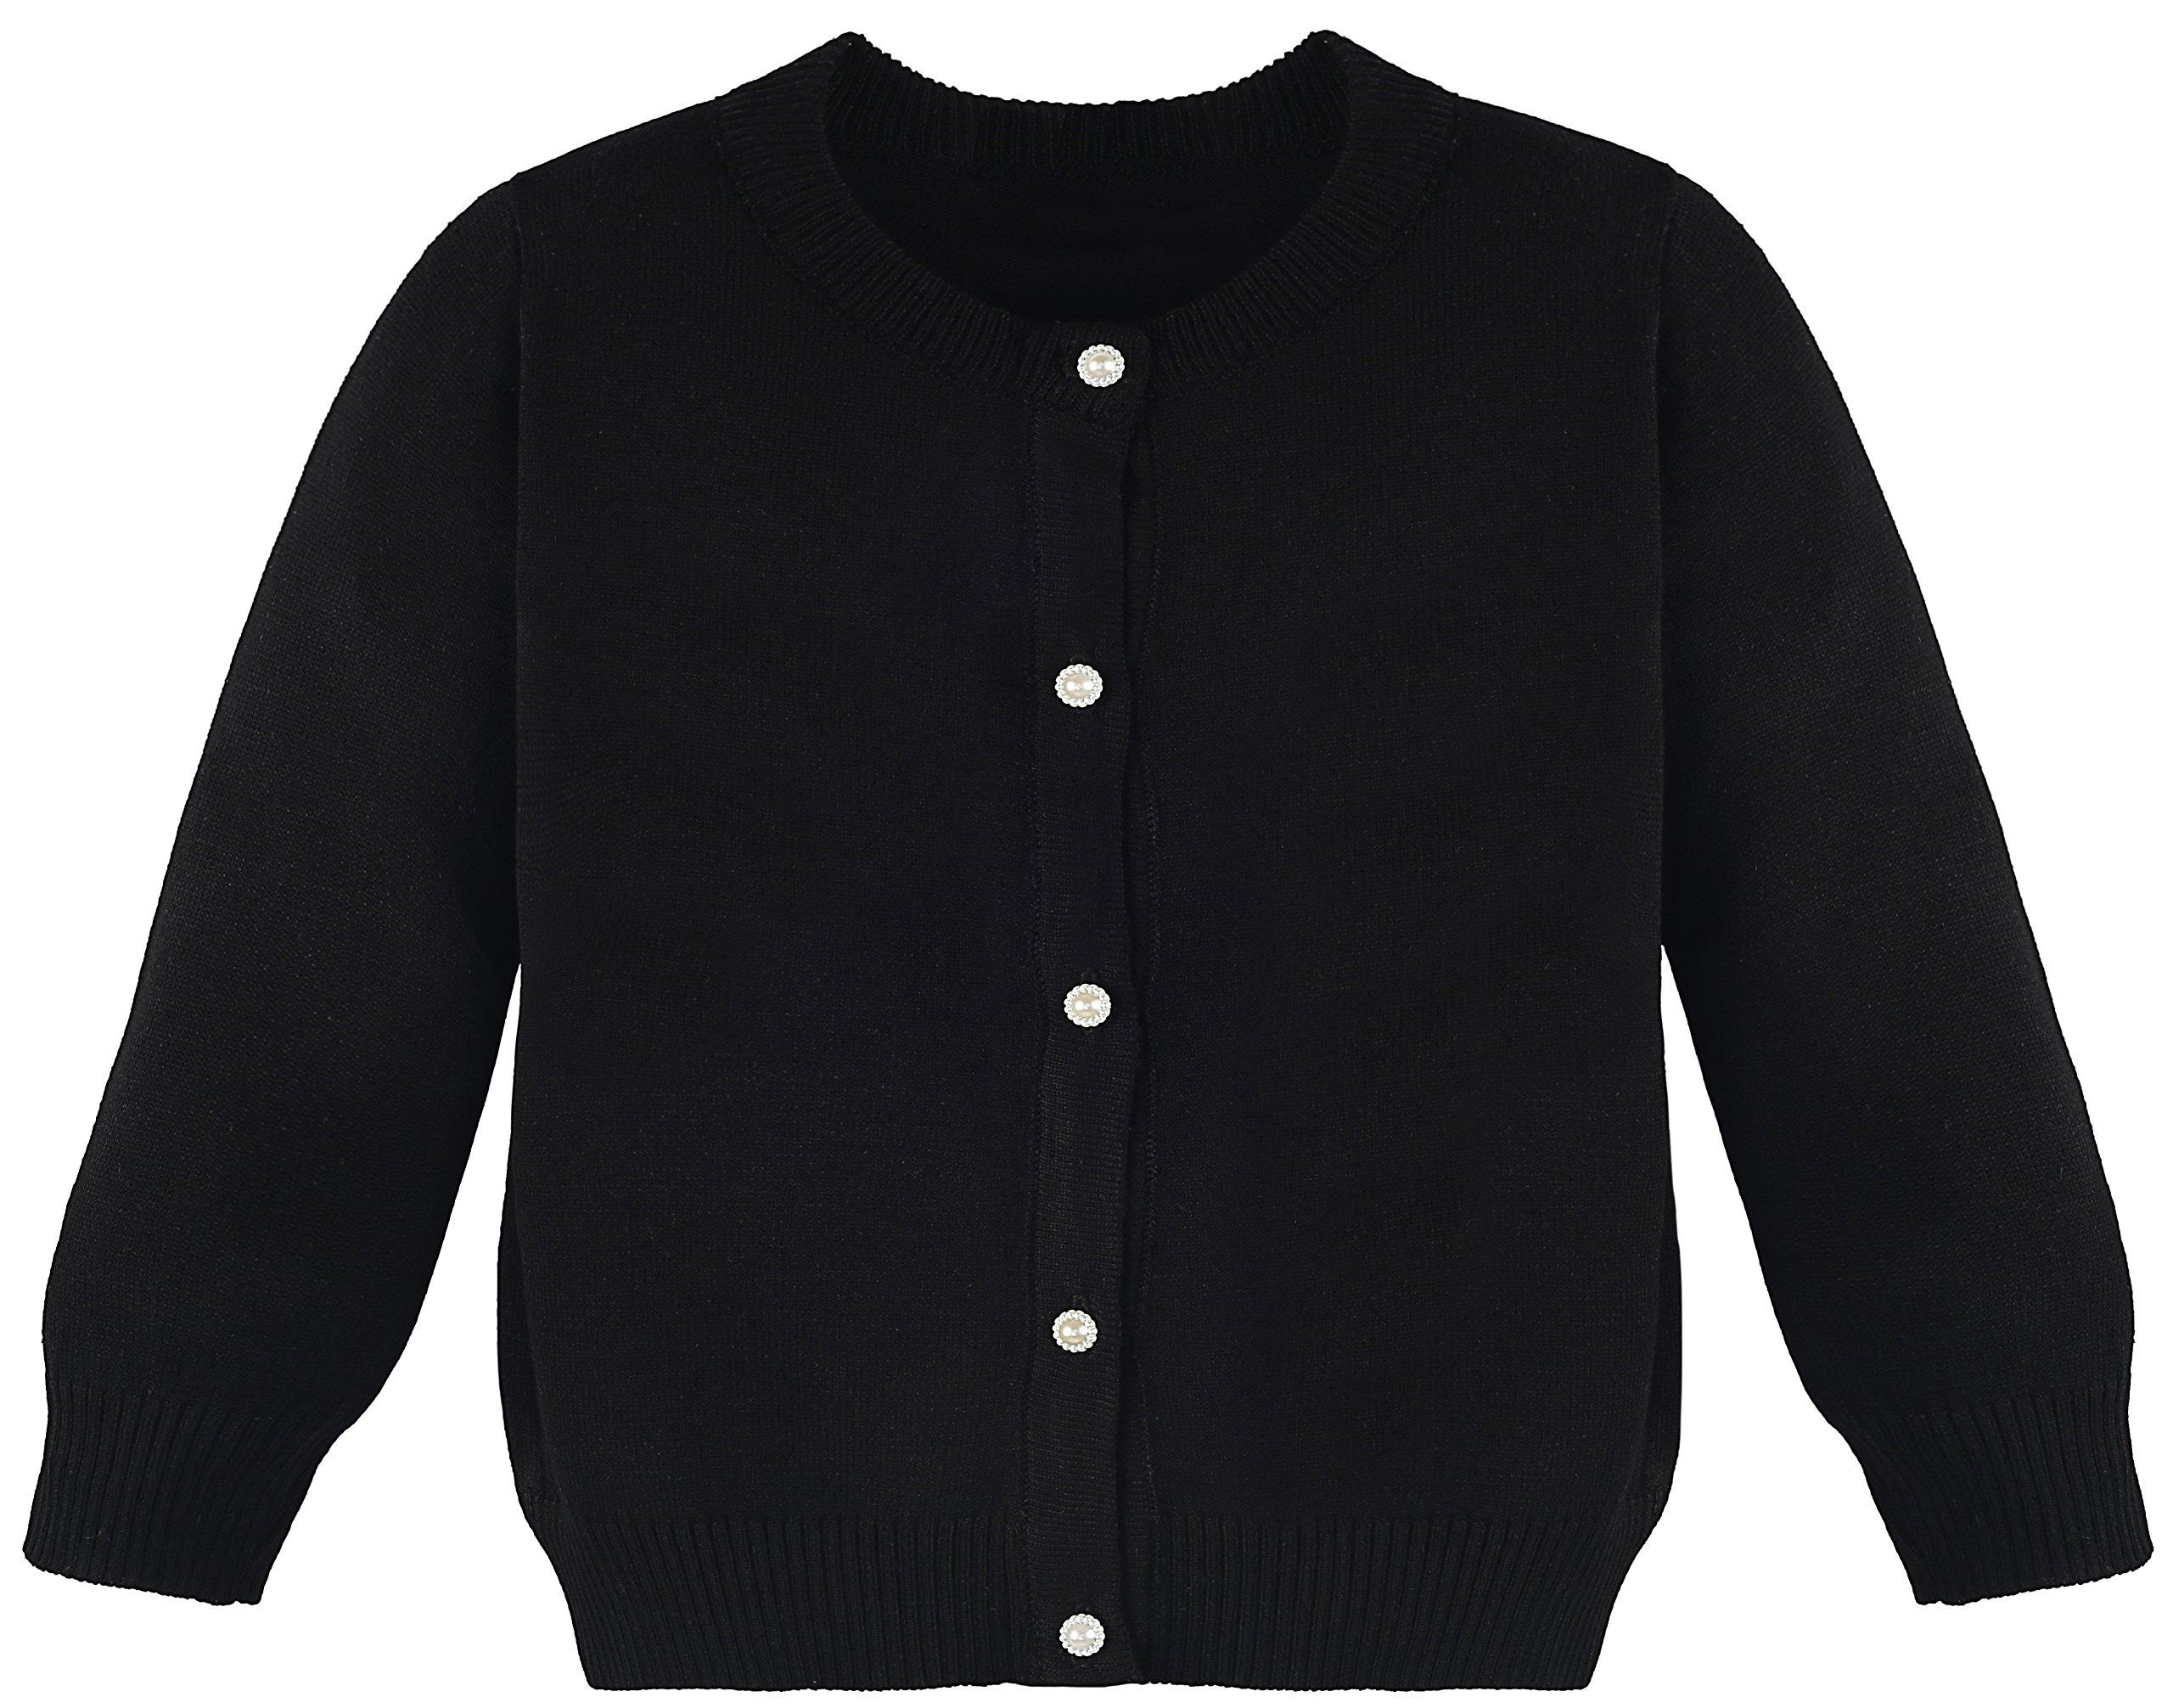 Lilax Little Girls' Knit Uniform Cardigan Long Sleeve Sweater 9 Black